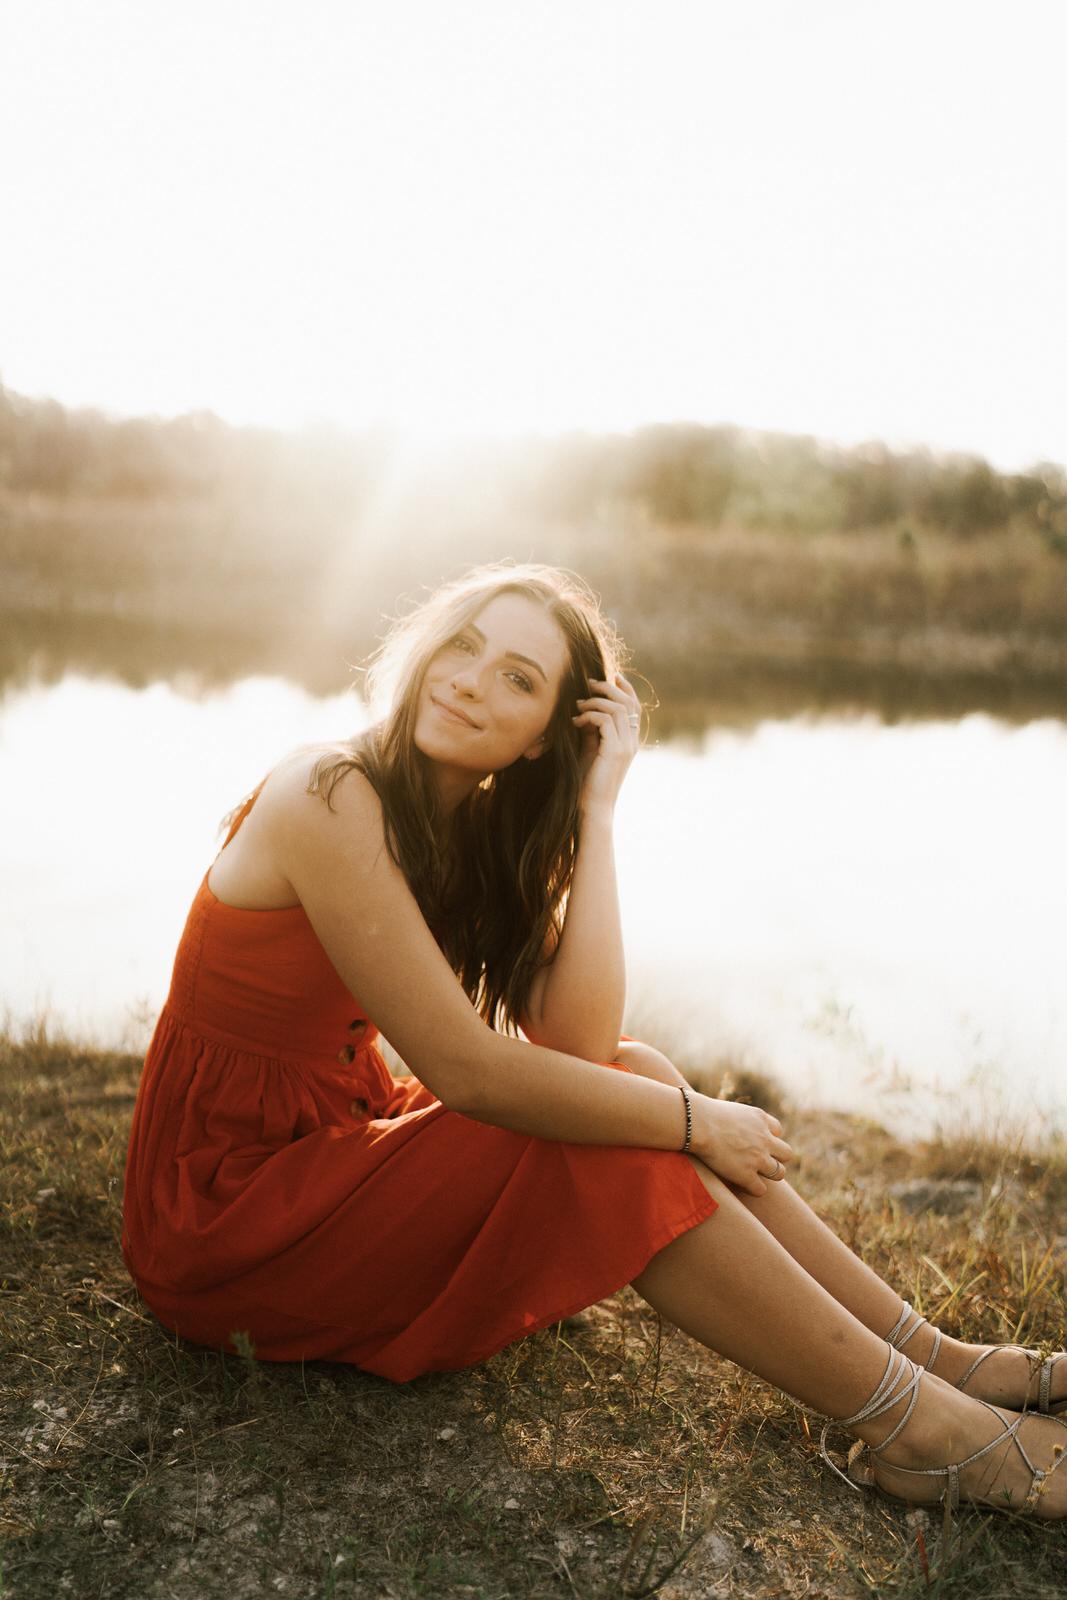 Fort Myers Senior Photos- Michelle Gonzalez Photography- Kate McQuagge-97.JPG